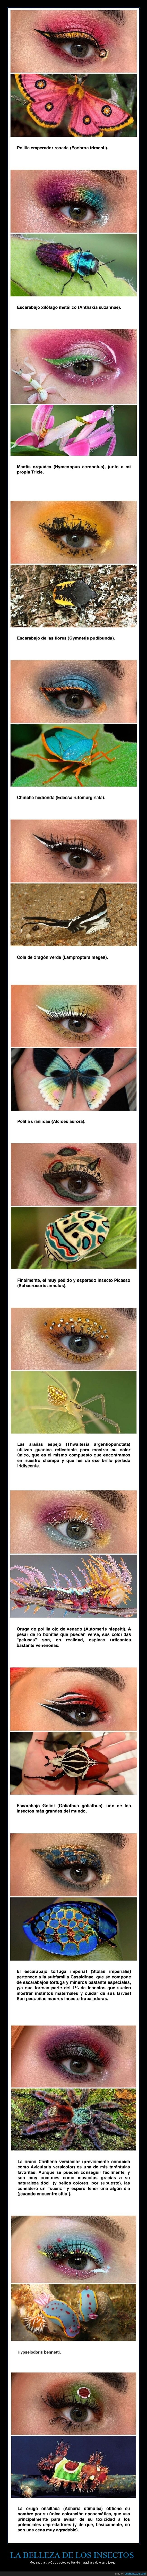 insectos,maquillaje,ojos